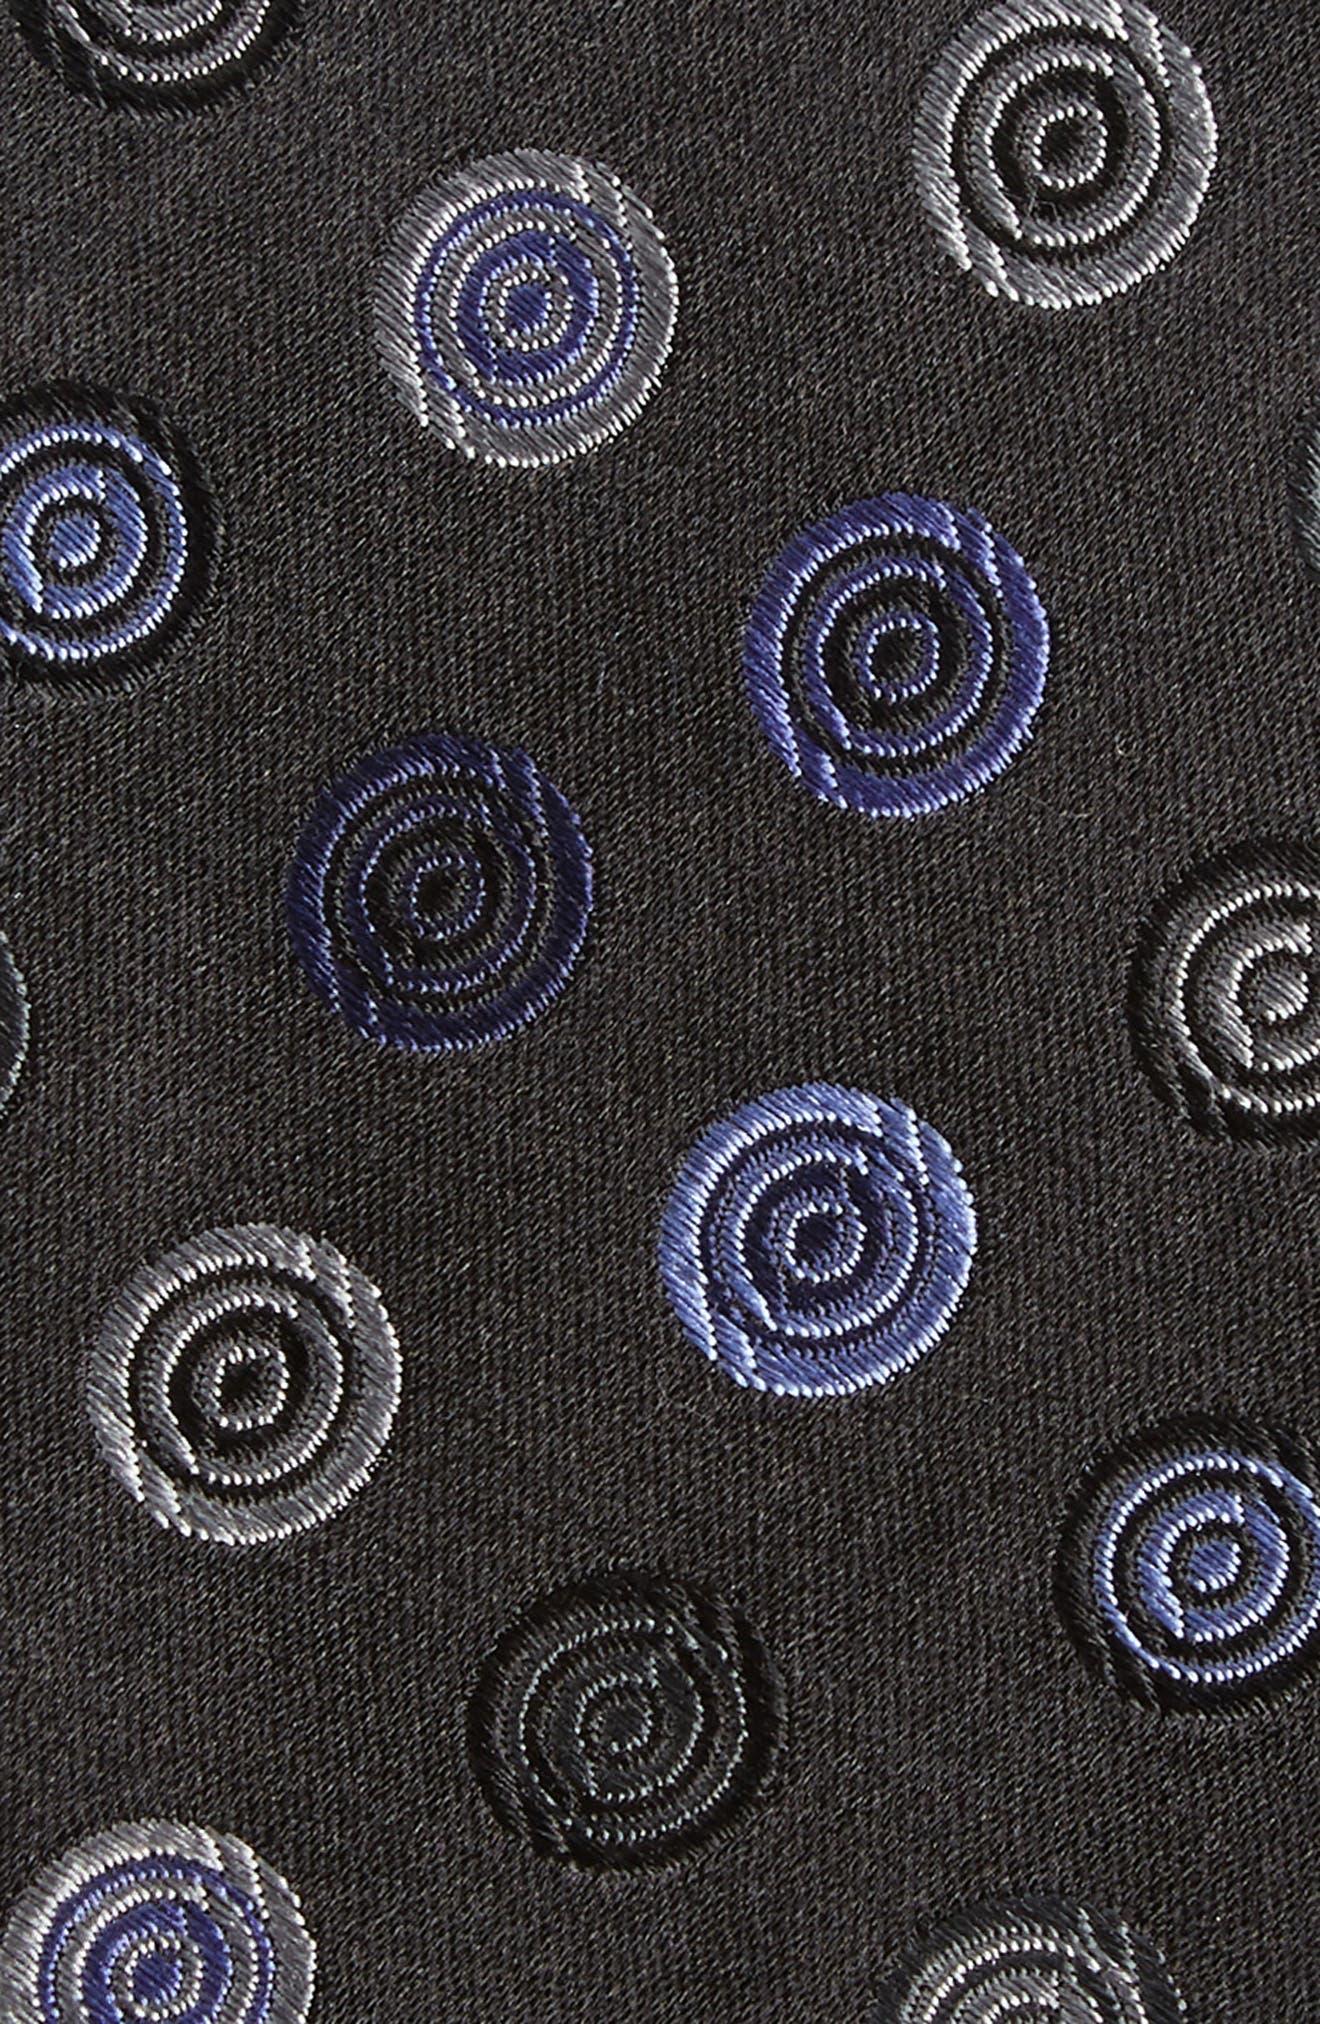 Santa Lucia Medallion Silk Tie,                             Alternate thumbnail 2, color,                             001